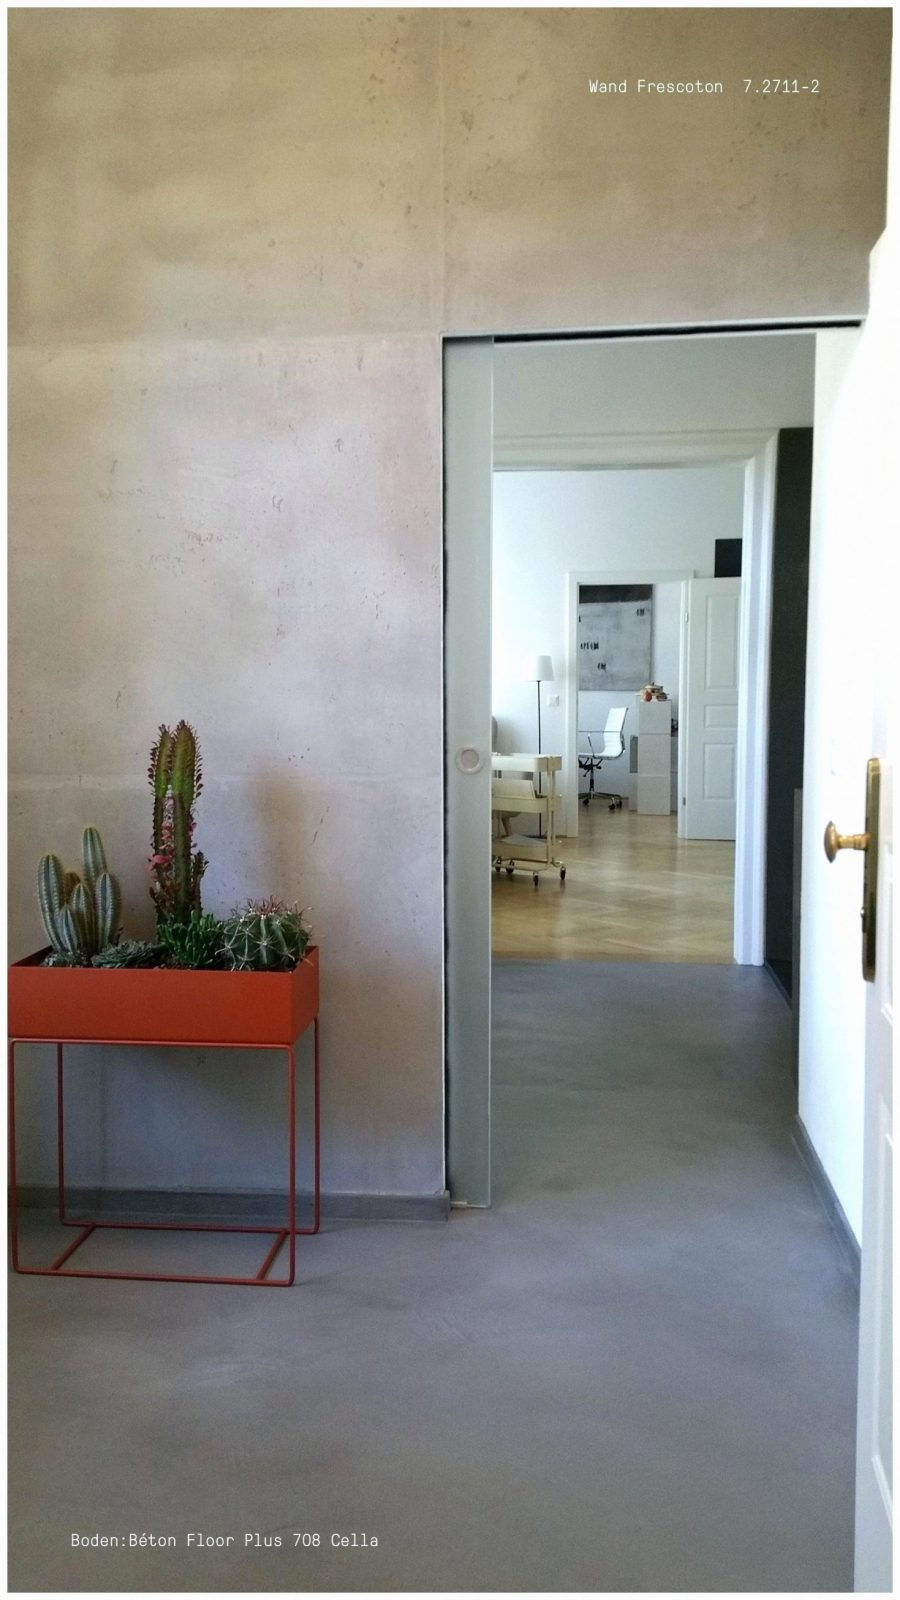 Wände Farbig Gestalten Ideen Models Elegant 30 Wände Gestalten Ohne von Wände Ohne Tapete Gestalten Bild